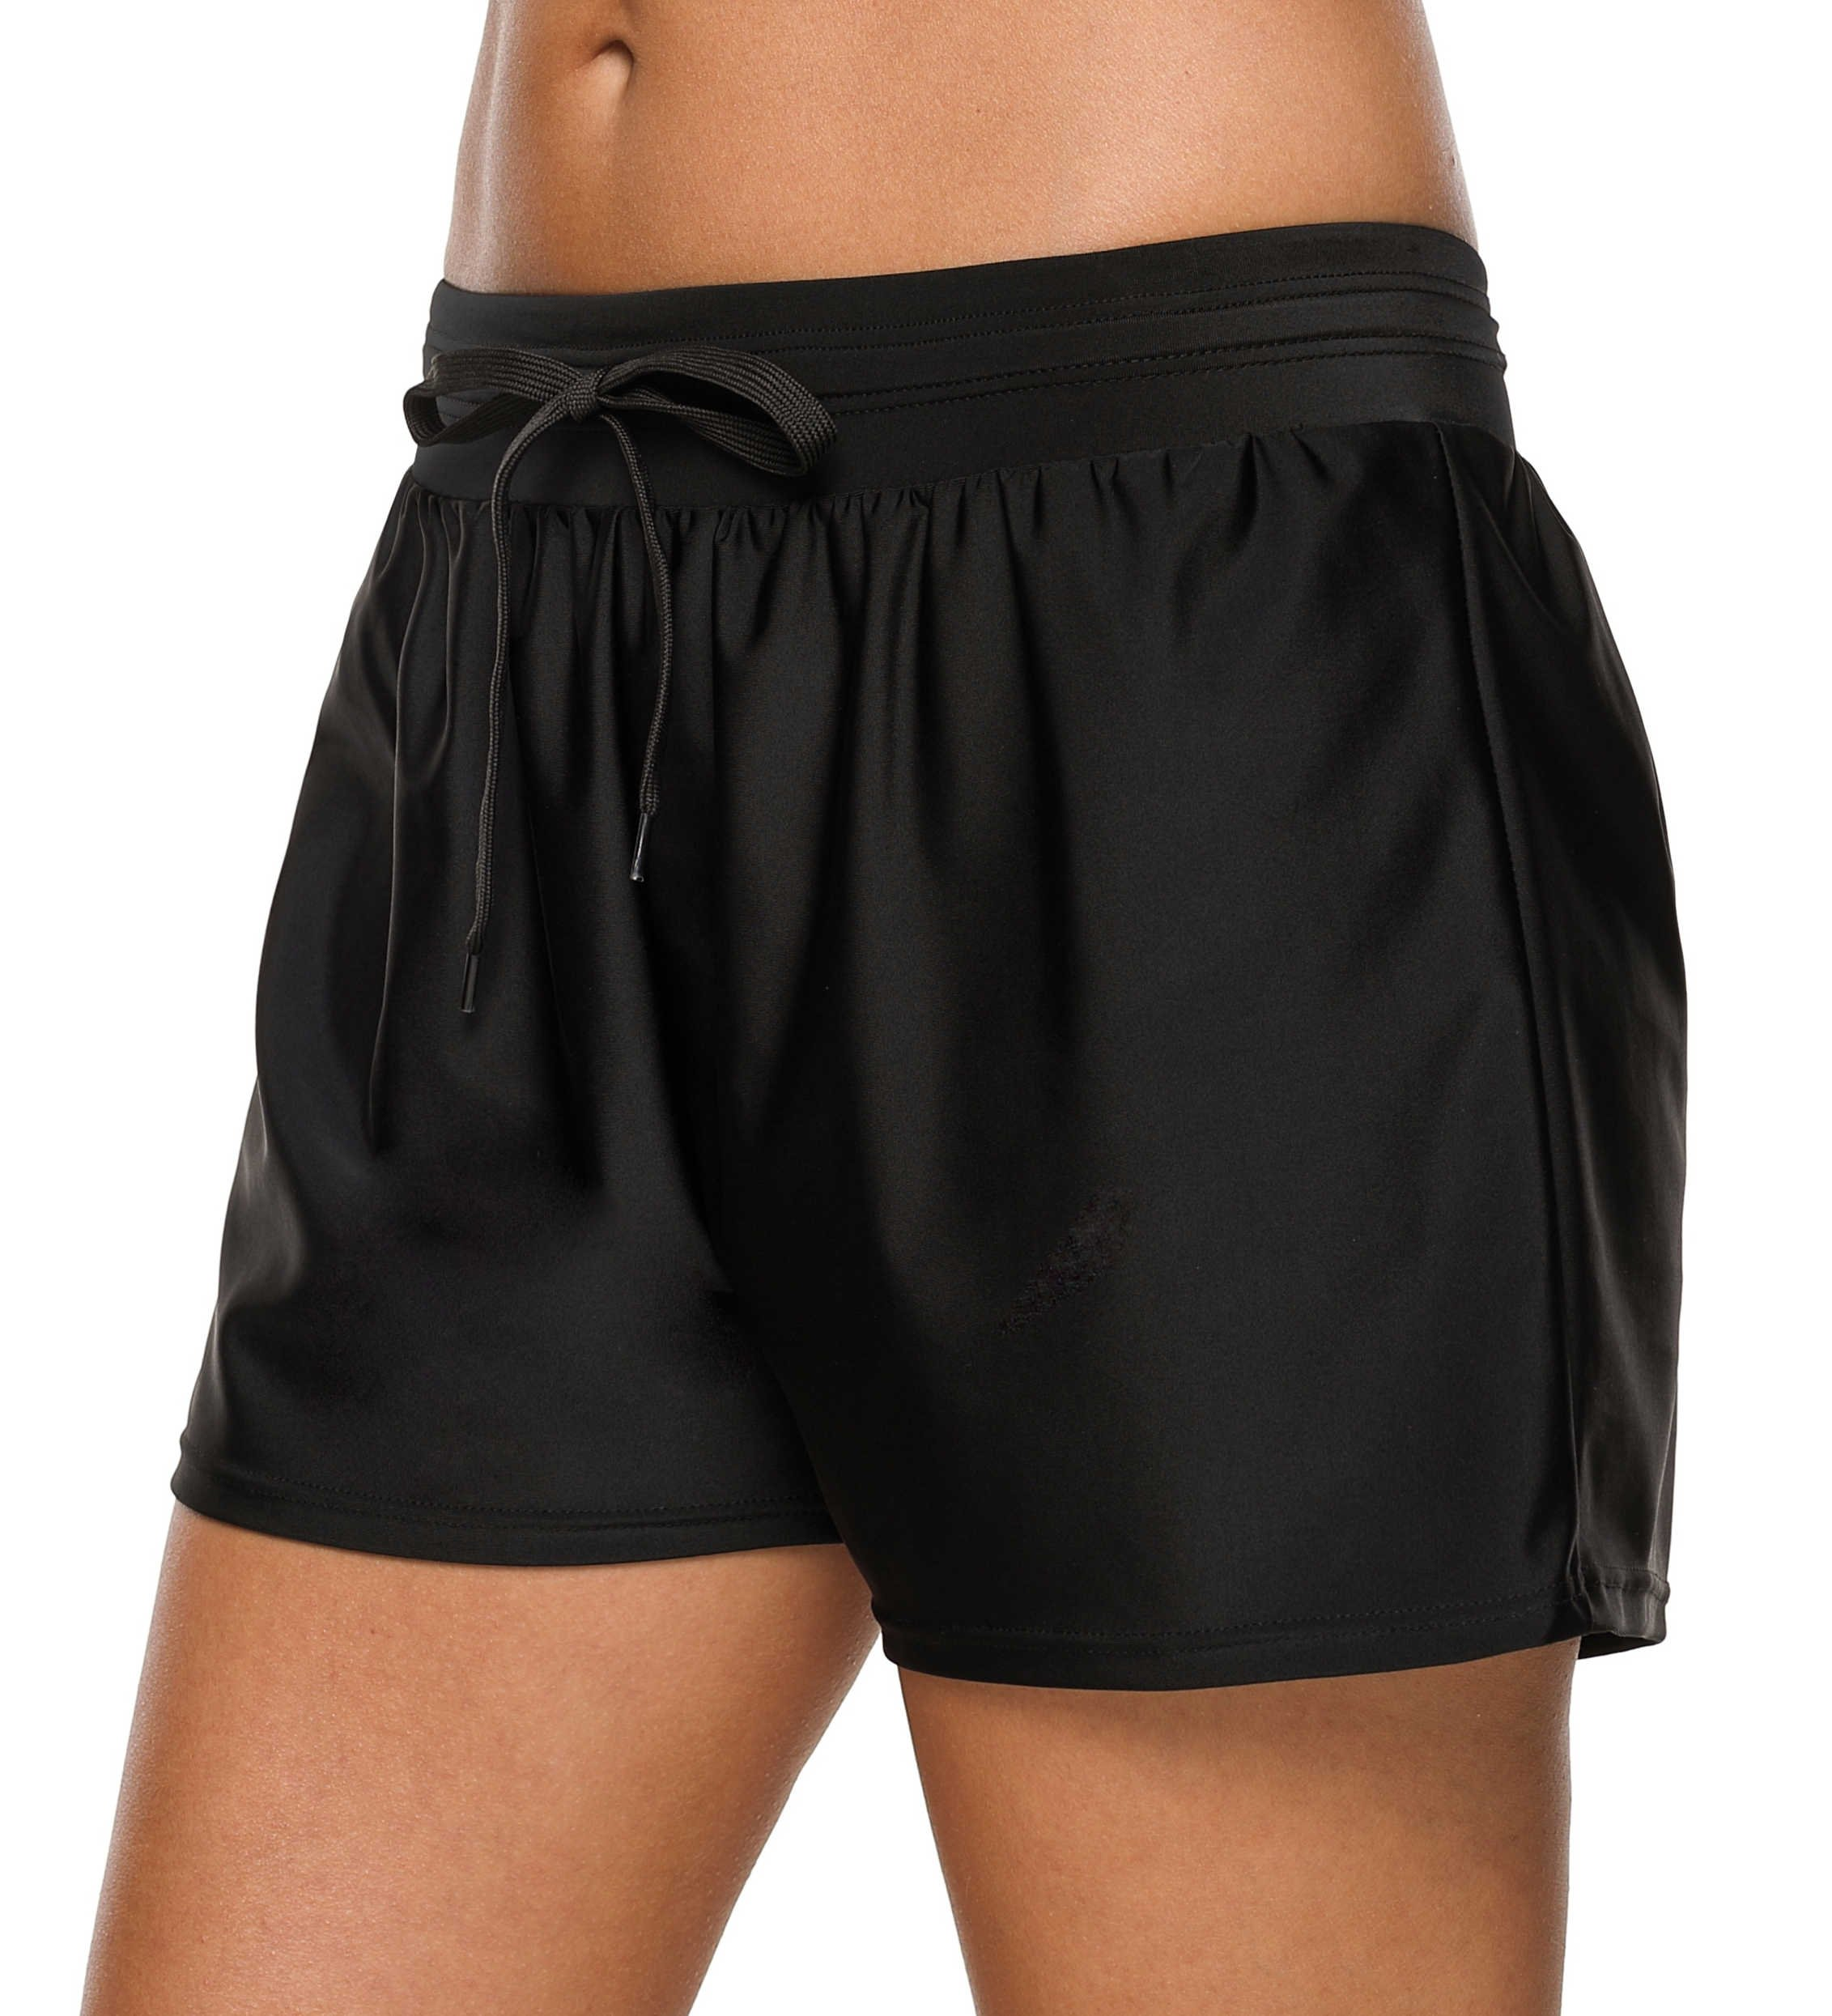 beautyin Womens Swim Bottoms Board Shorts Swimsuit Bathing Suit Shorts Black 2XL by beautyin (Image #3)